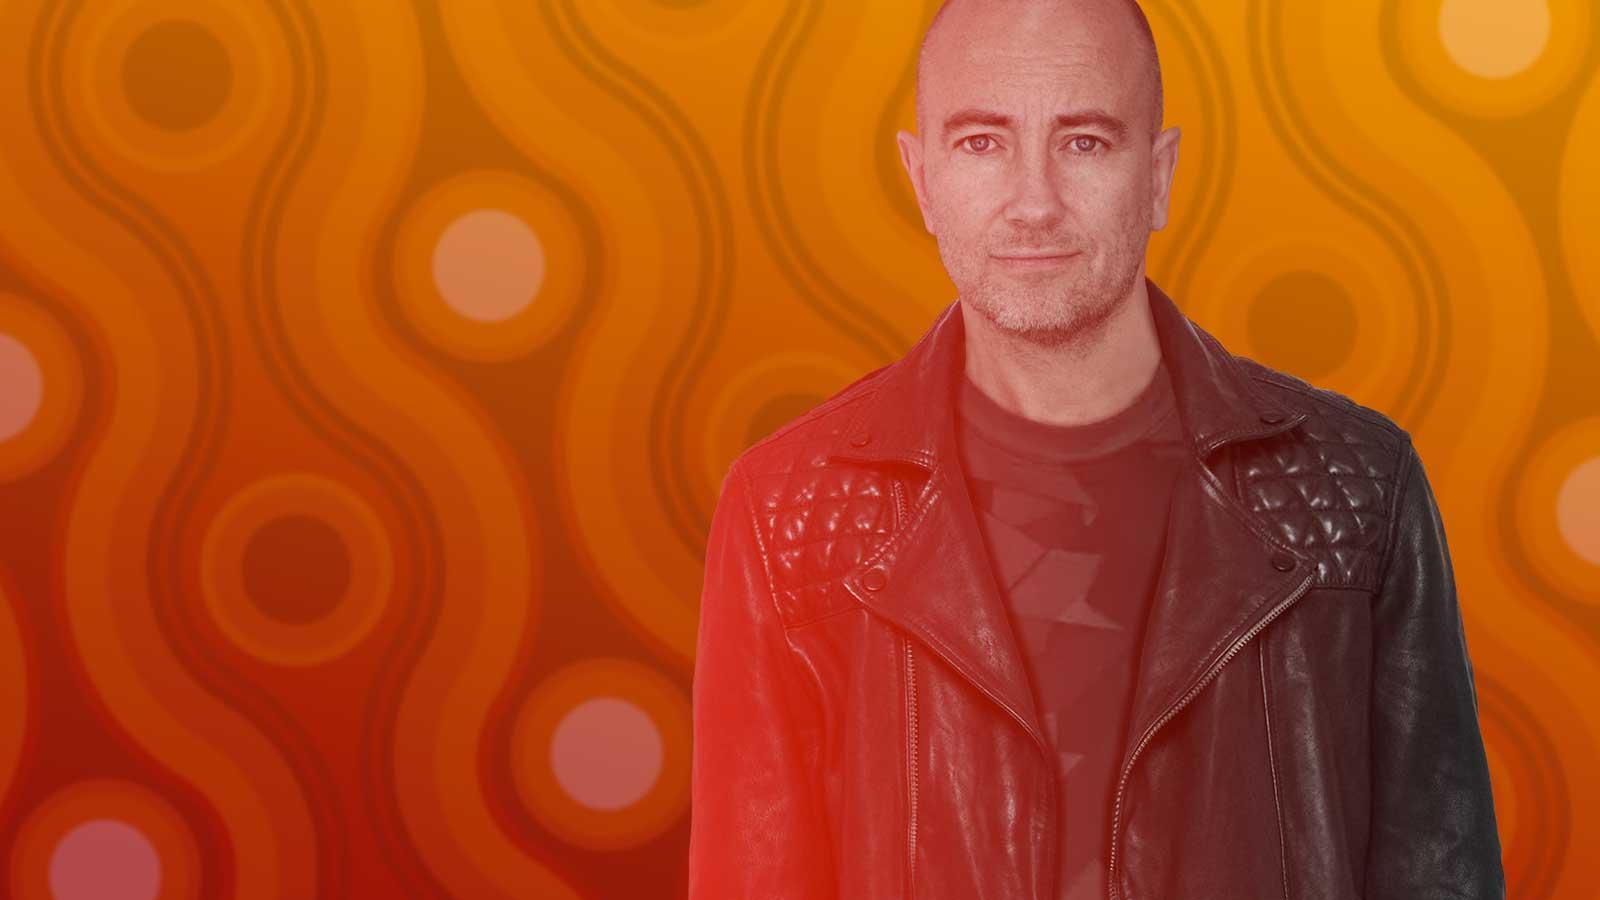 Jason Regan DJ, presenter, event production, disco expert